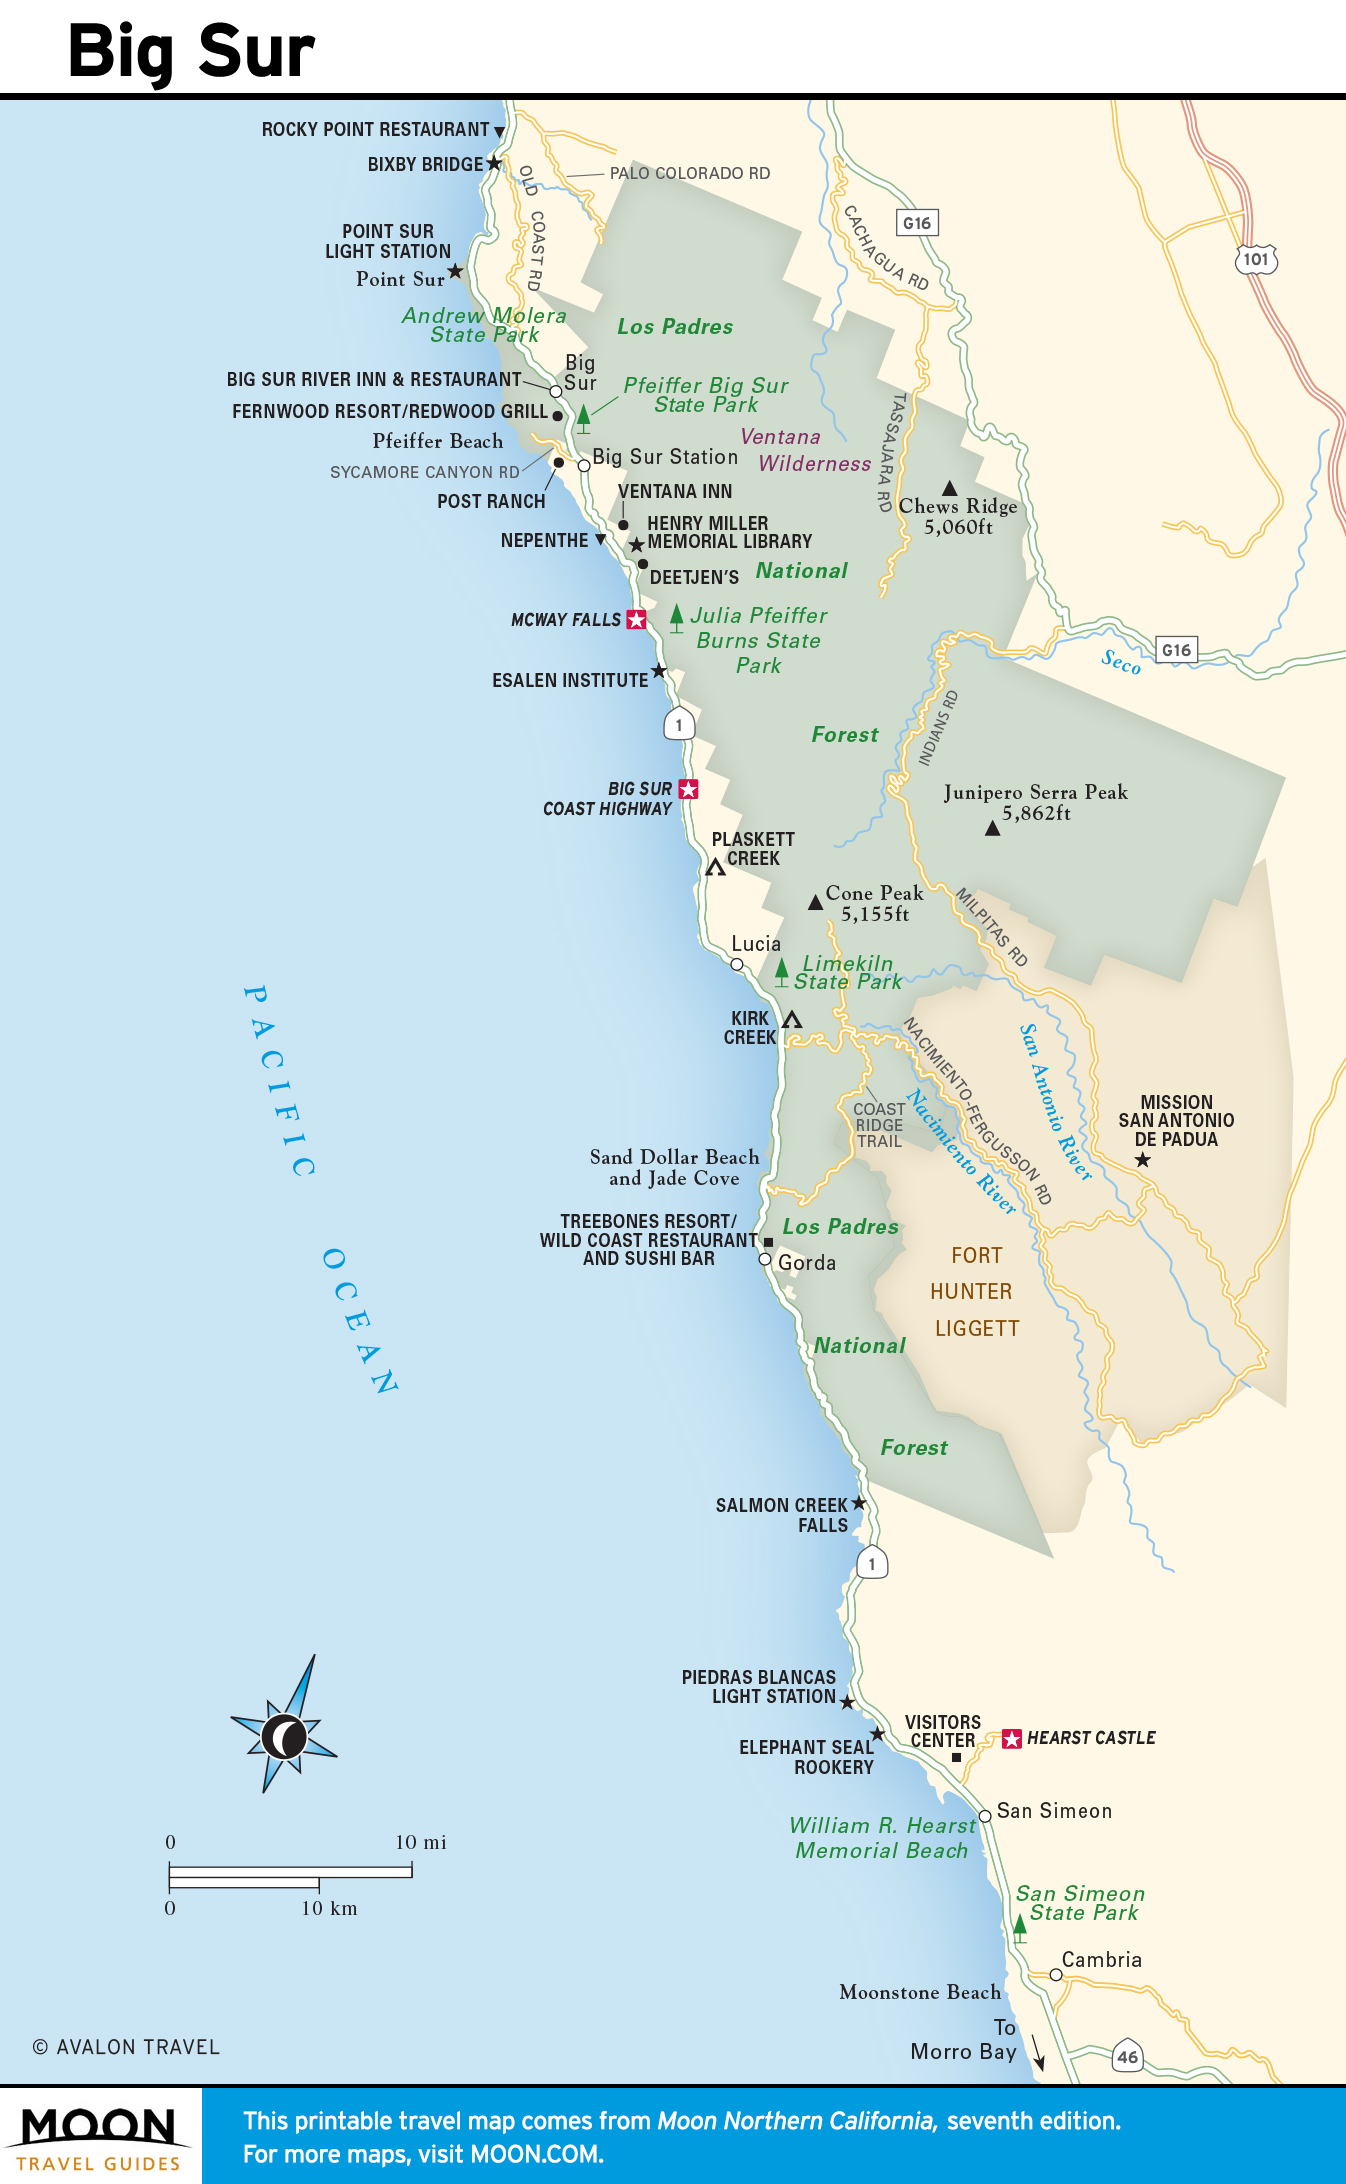 Coastal California | Moon Travel Guides on ca road map, calif beach map, city of redding ca map, newport beach ca map, north california counties map, calif forest map, southern california beach cities map, california coastline map, calif fires map, humboldt california map, city of beaumont ca map, calif map w cities, calif delta map, ca coastal map, calif redwoods map, buellton ca map, calif oregon map, calif city map, calif wildfires map, ca hwy map,